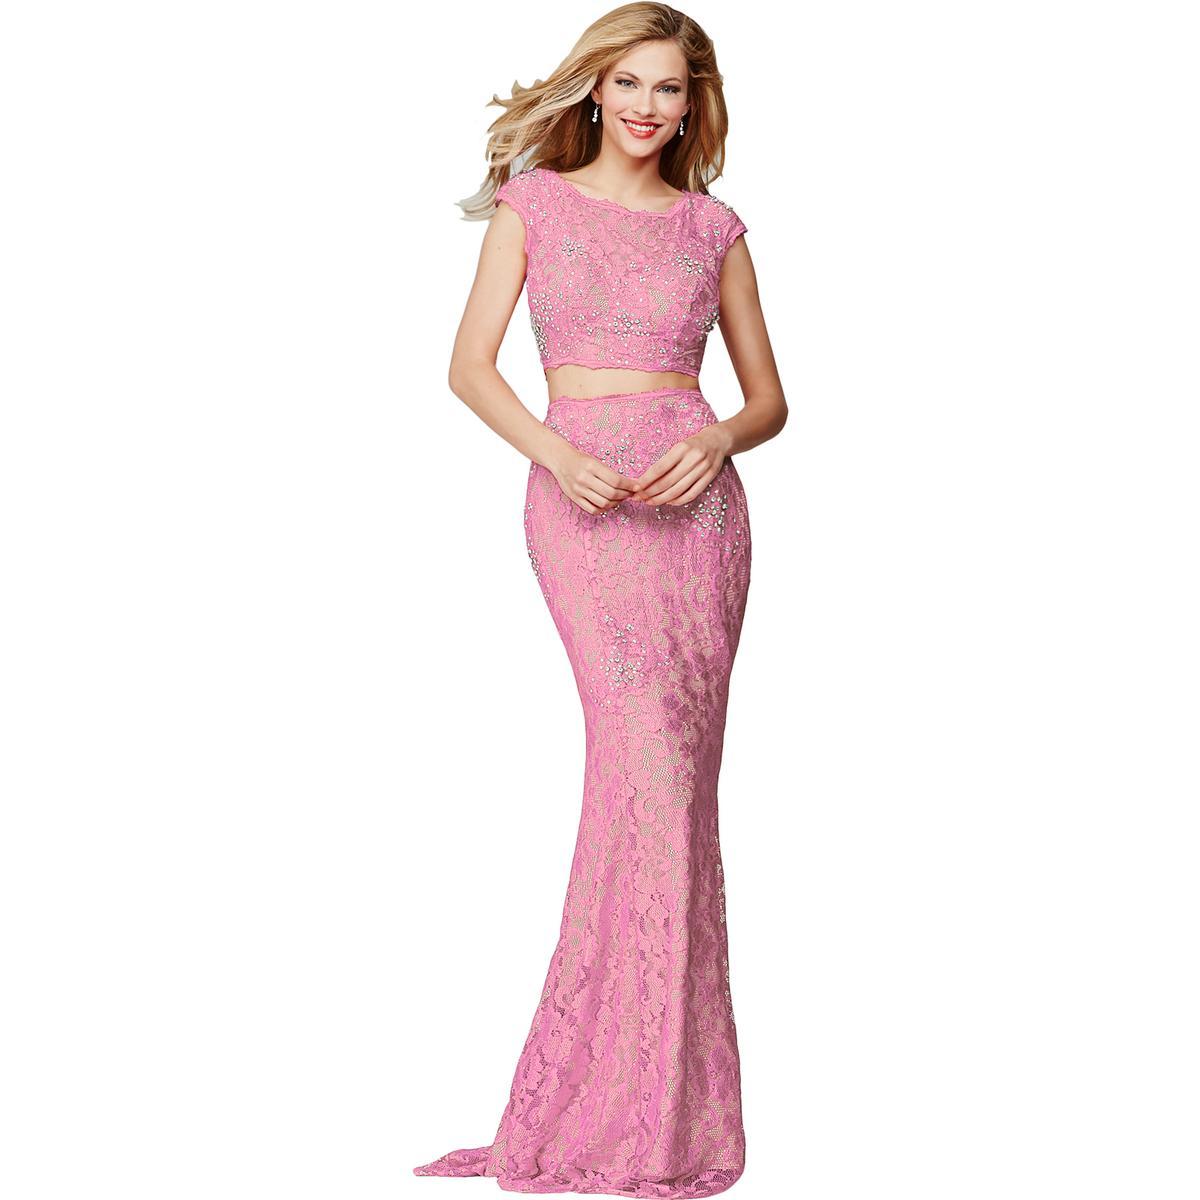 Jovani 8837 2PC Lace Prom Crop Top Dress Gown BHFO   eBay